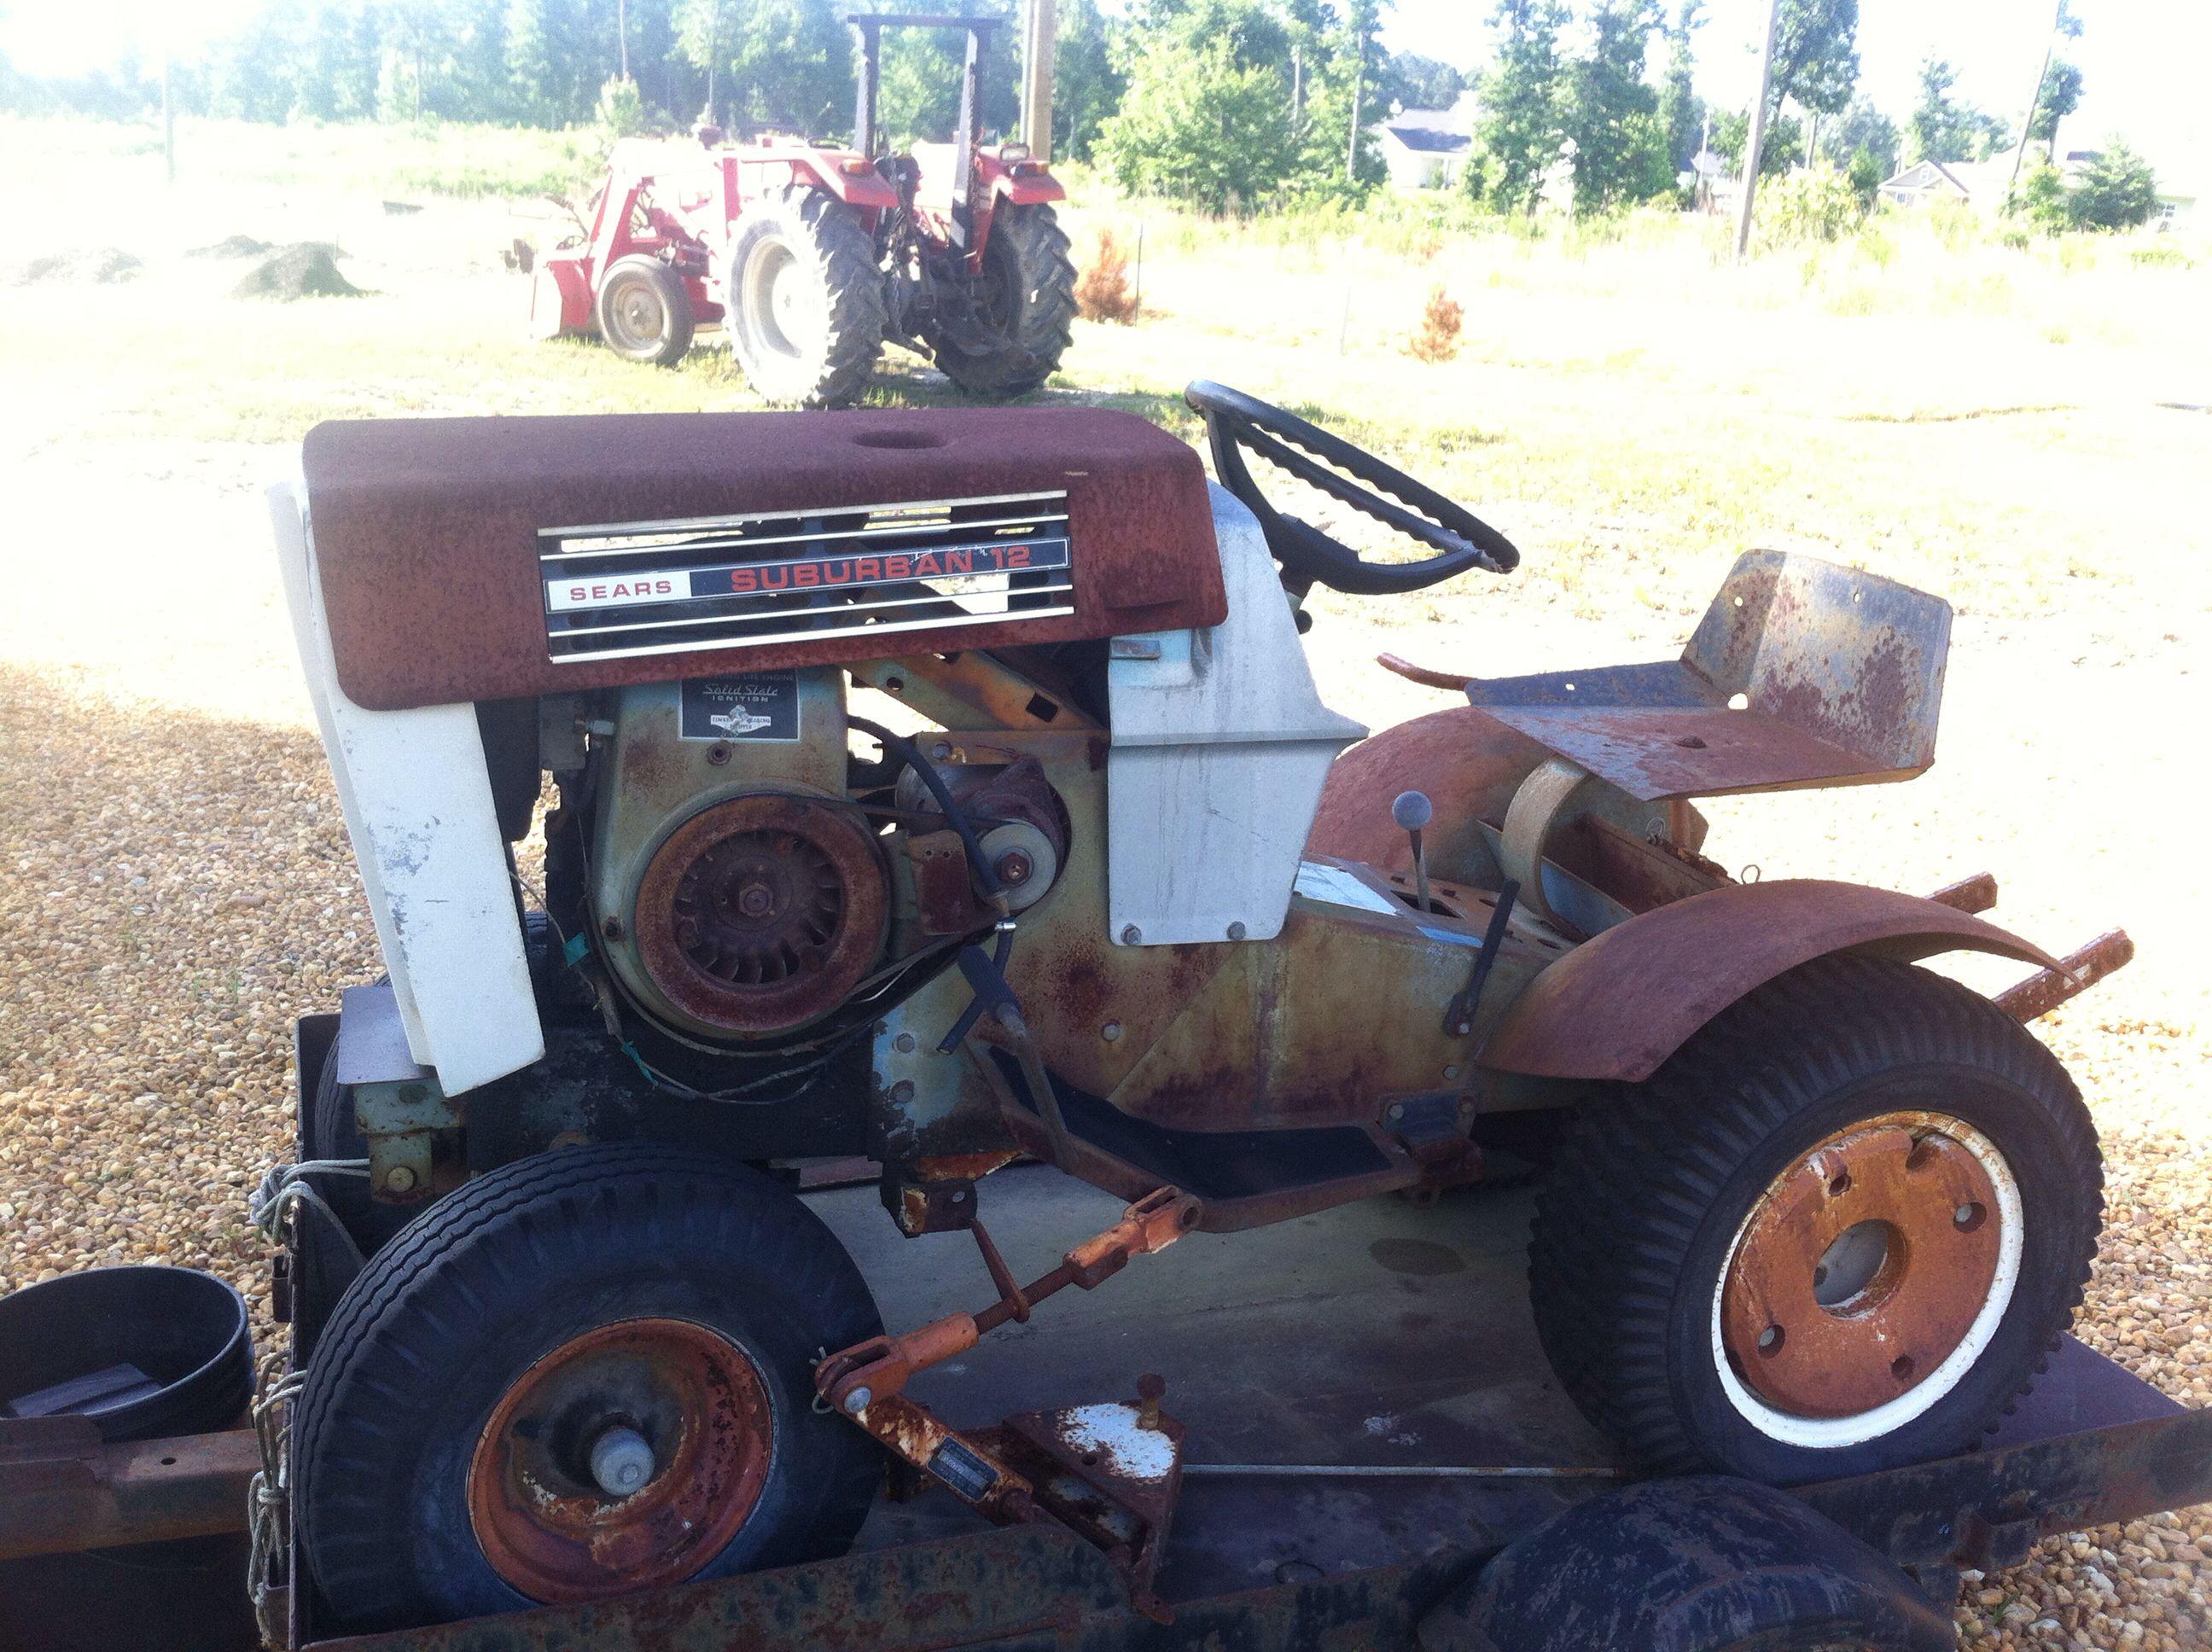 Sears Suburban 12 Garden Tractor : Sears suburban vintage tractors riding mowers